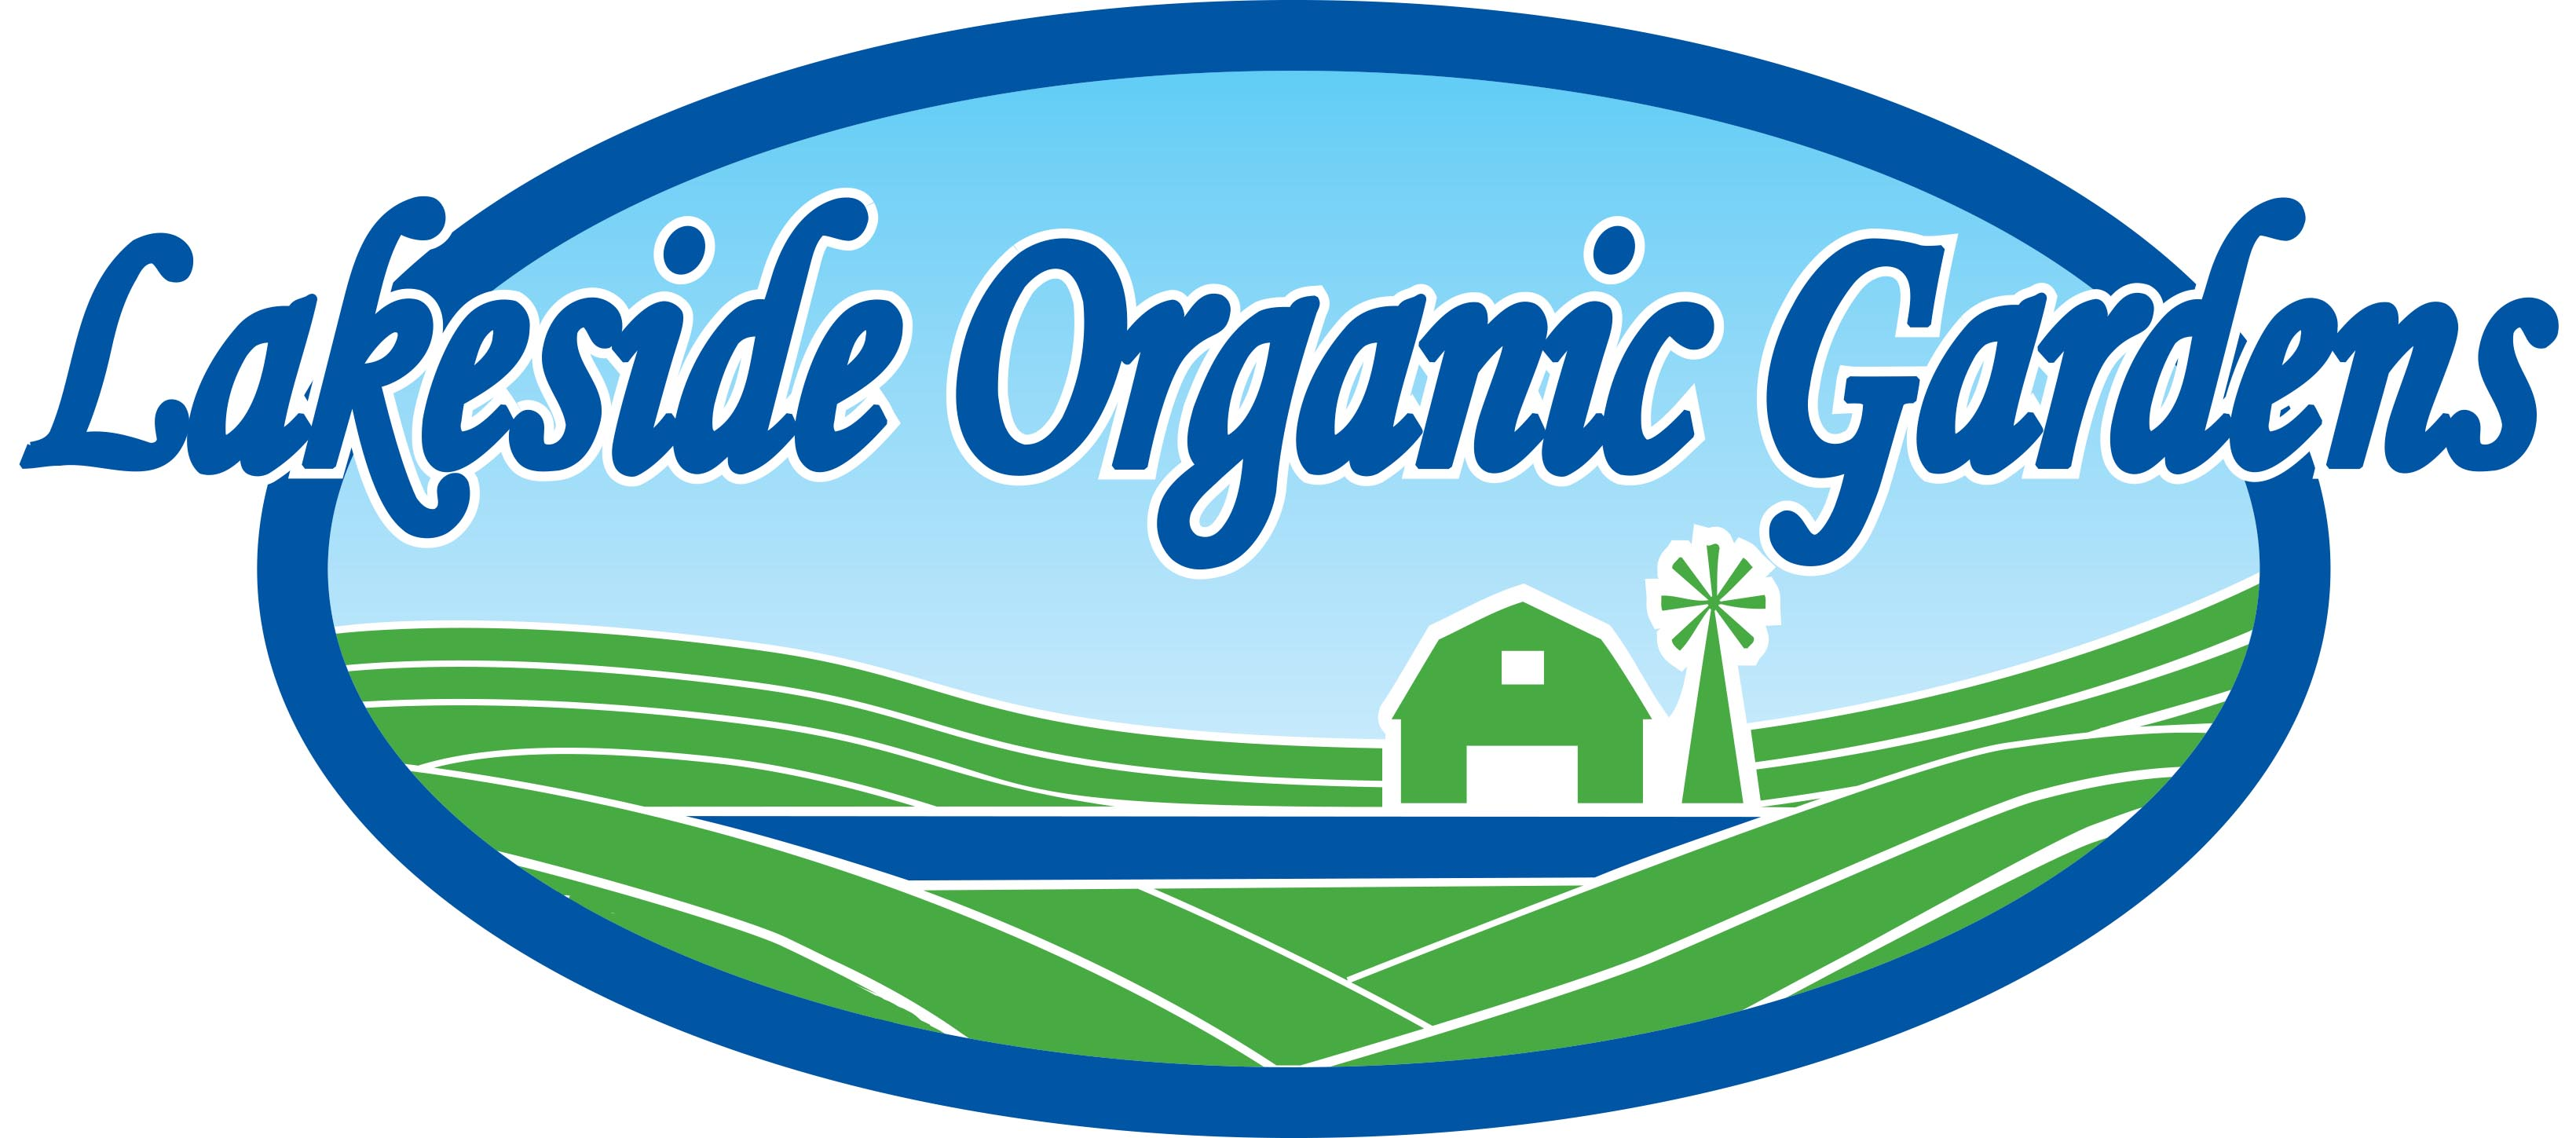 Lakeside Organic Gardens | Ecological Farming Association